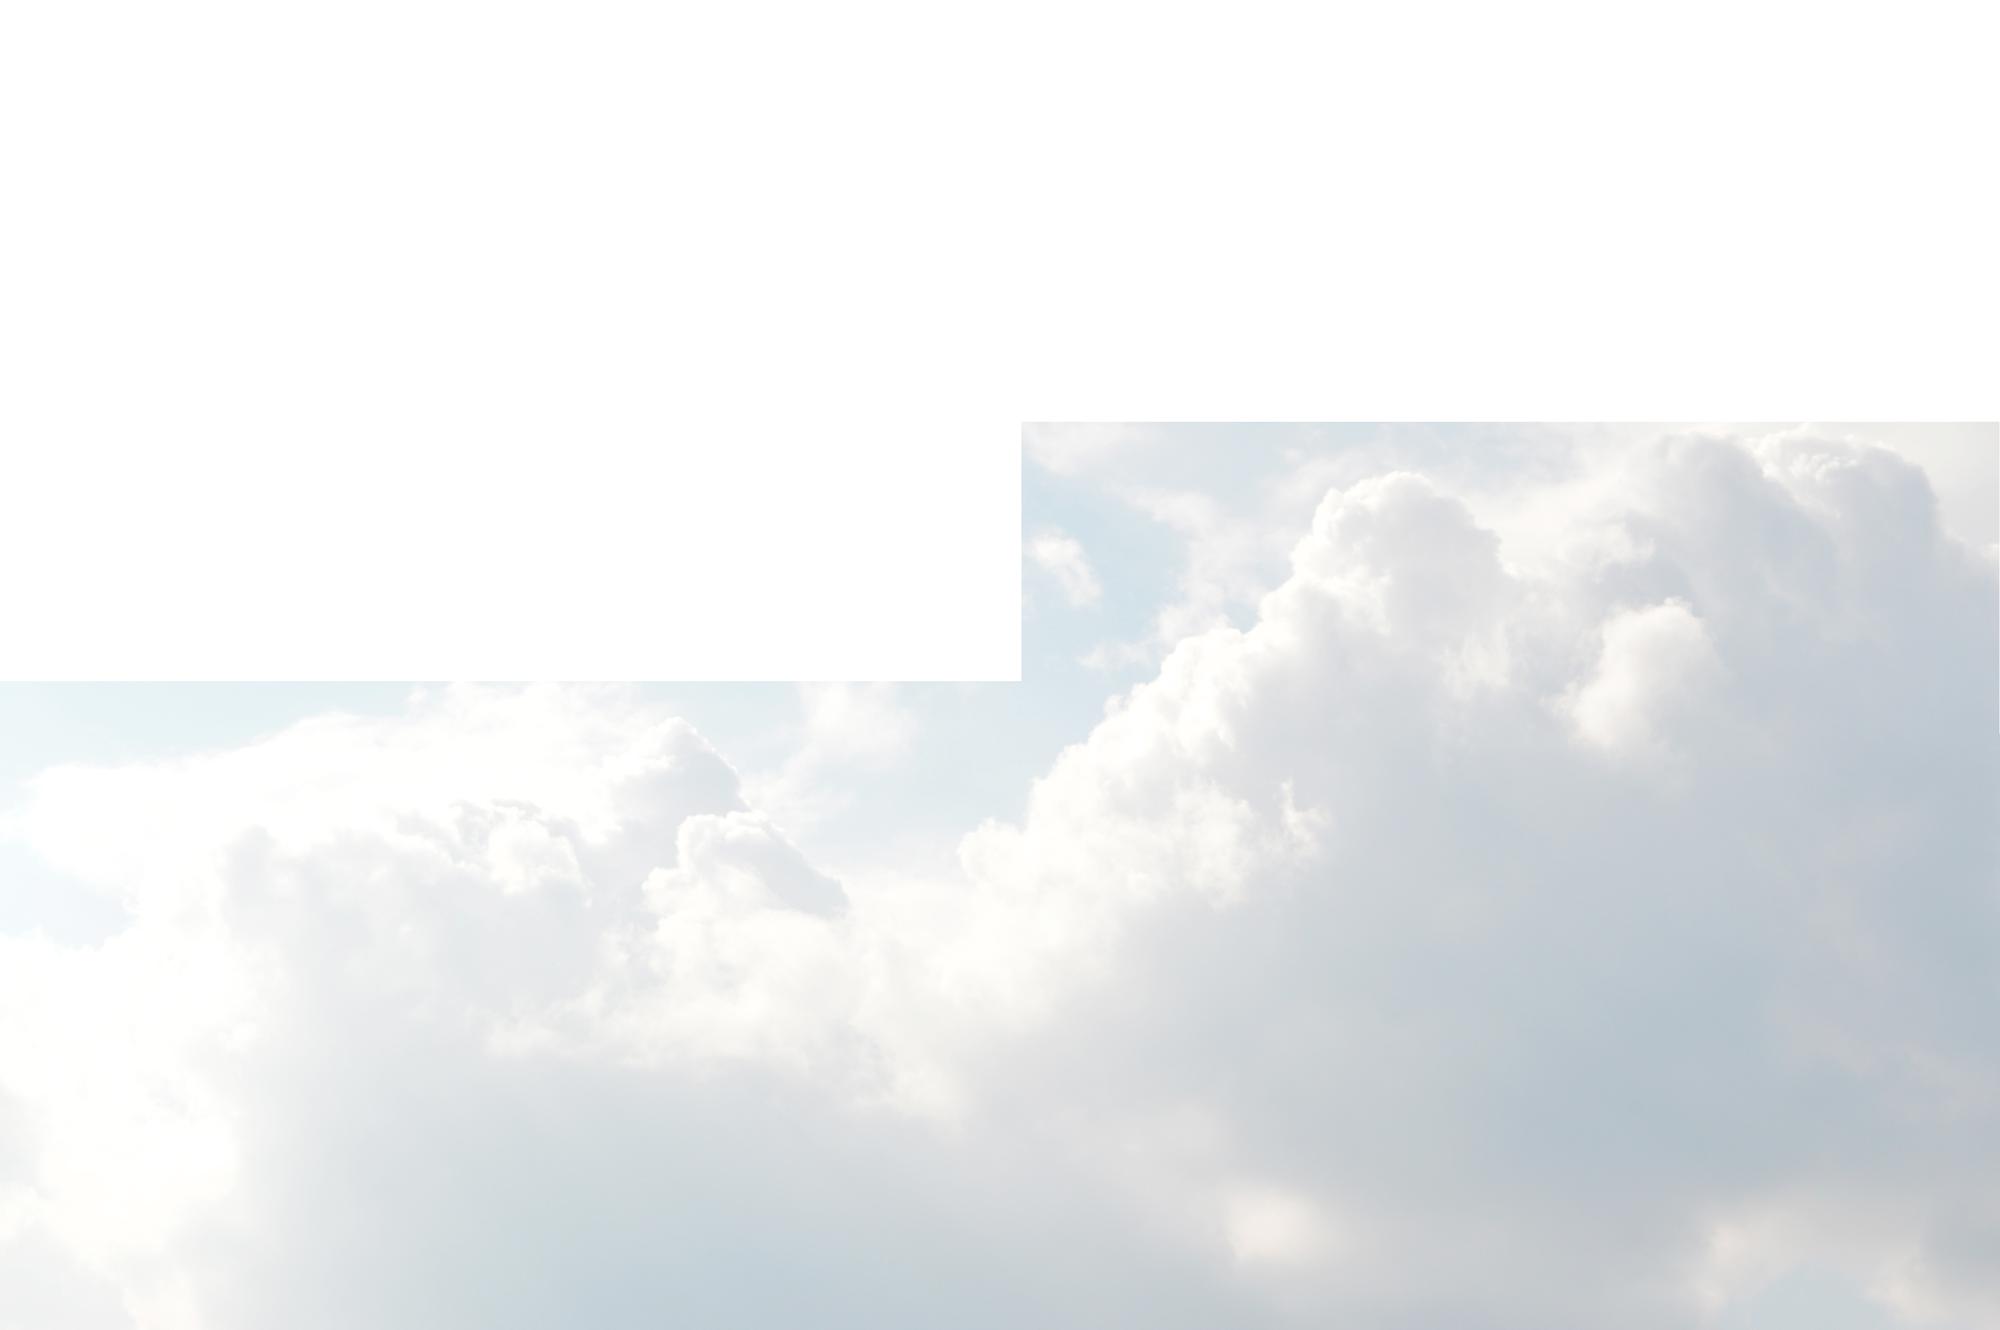 Immobilienglück Wolken